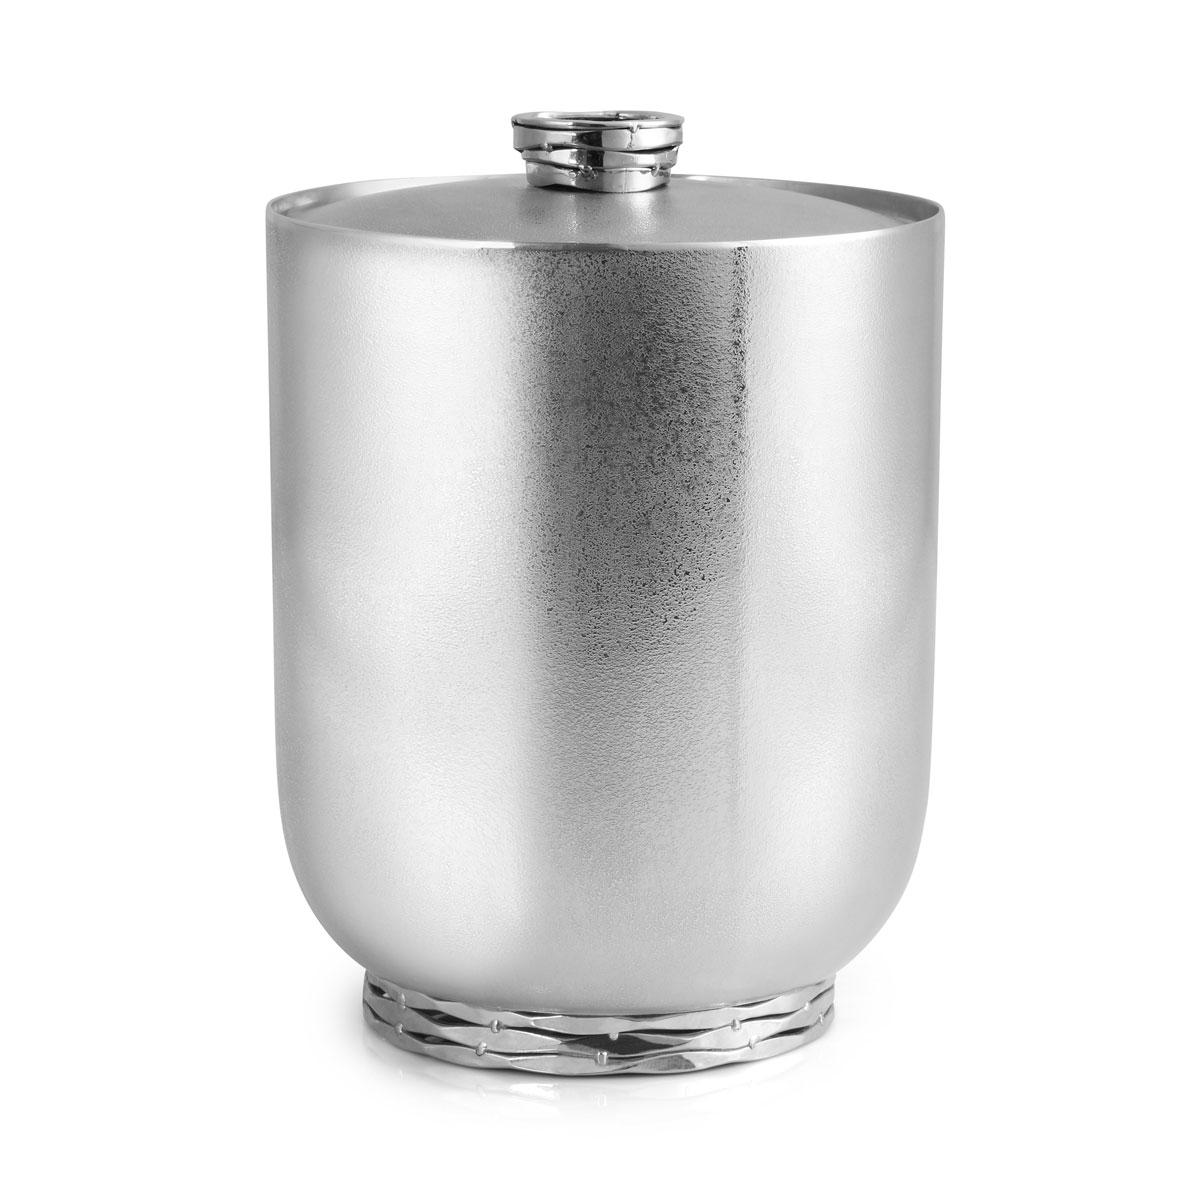 Michael Aram Mirage Ice Bucket